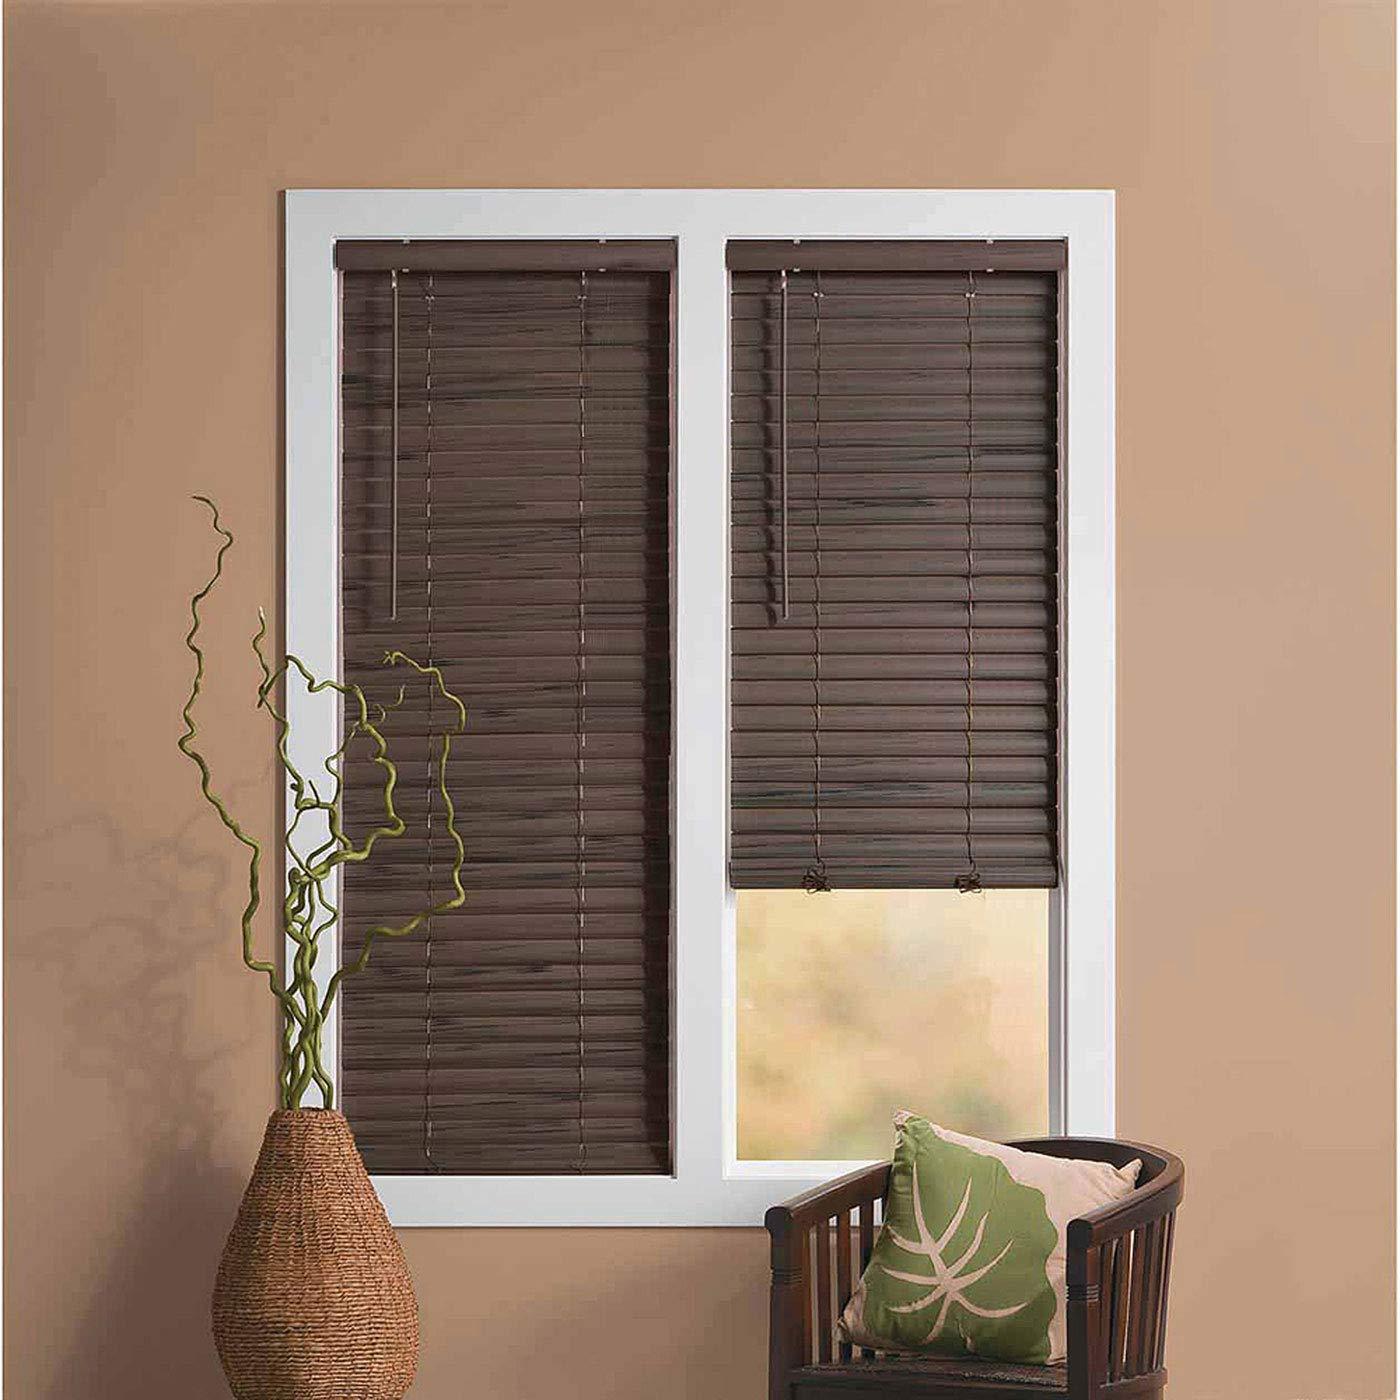 PowerSellerUSA Cordless Window Blinds, 2'' Slats Vinyl Mini Blind, Premium Quality Embossed Woodgrain, Anti-UV Window Treatment, Mahogany, 33'' Width x 64'' Length, (Fits Windows 18'' - 72'') by PowerSellerUSA